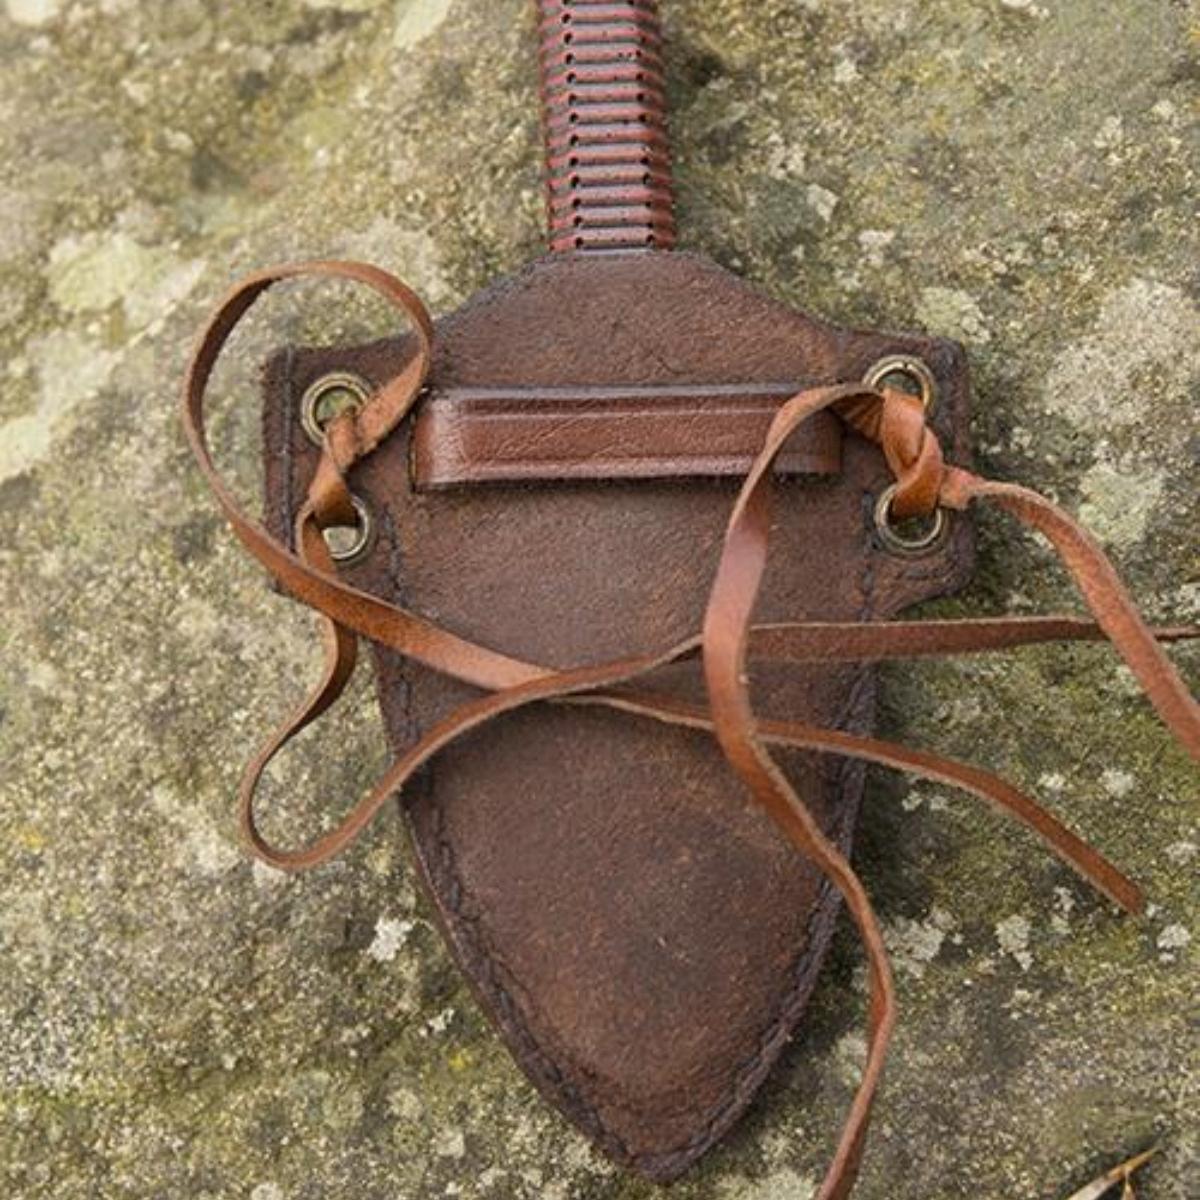 LARP kunai knife with holder, brown